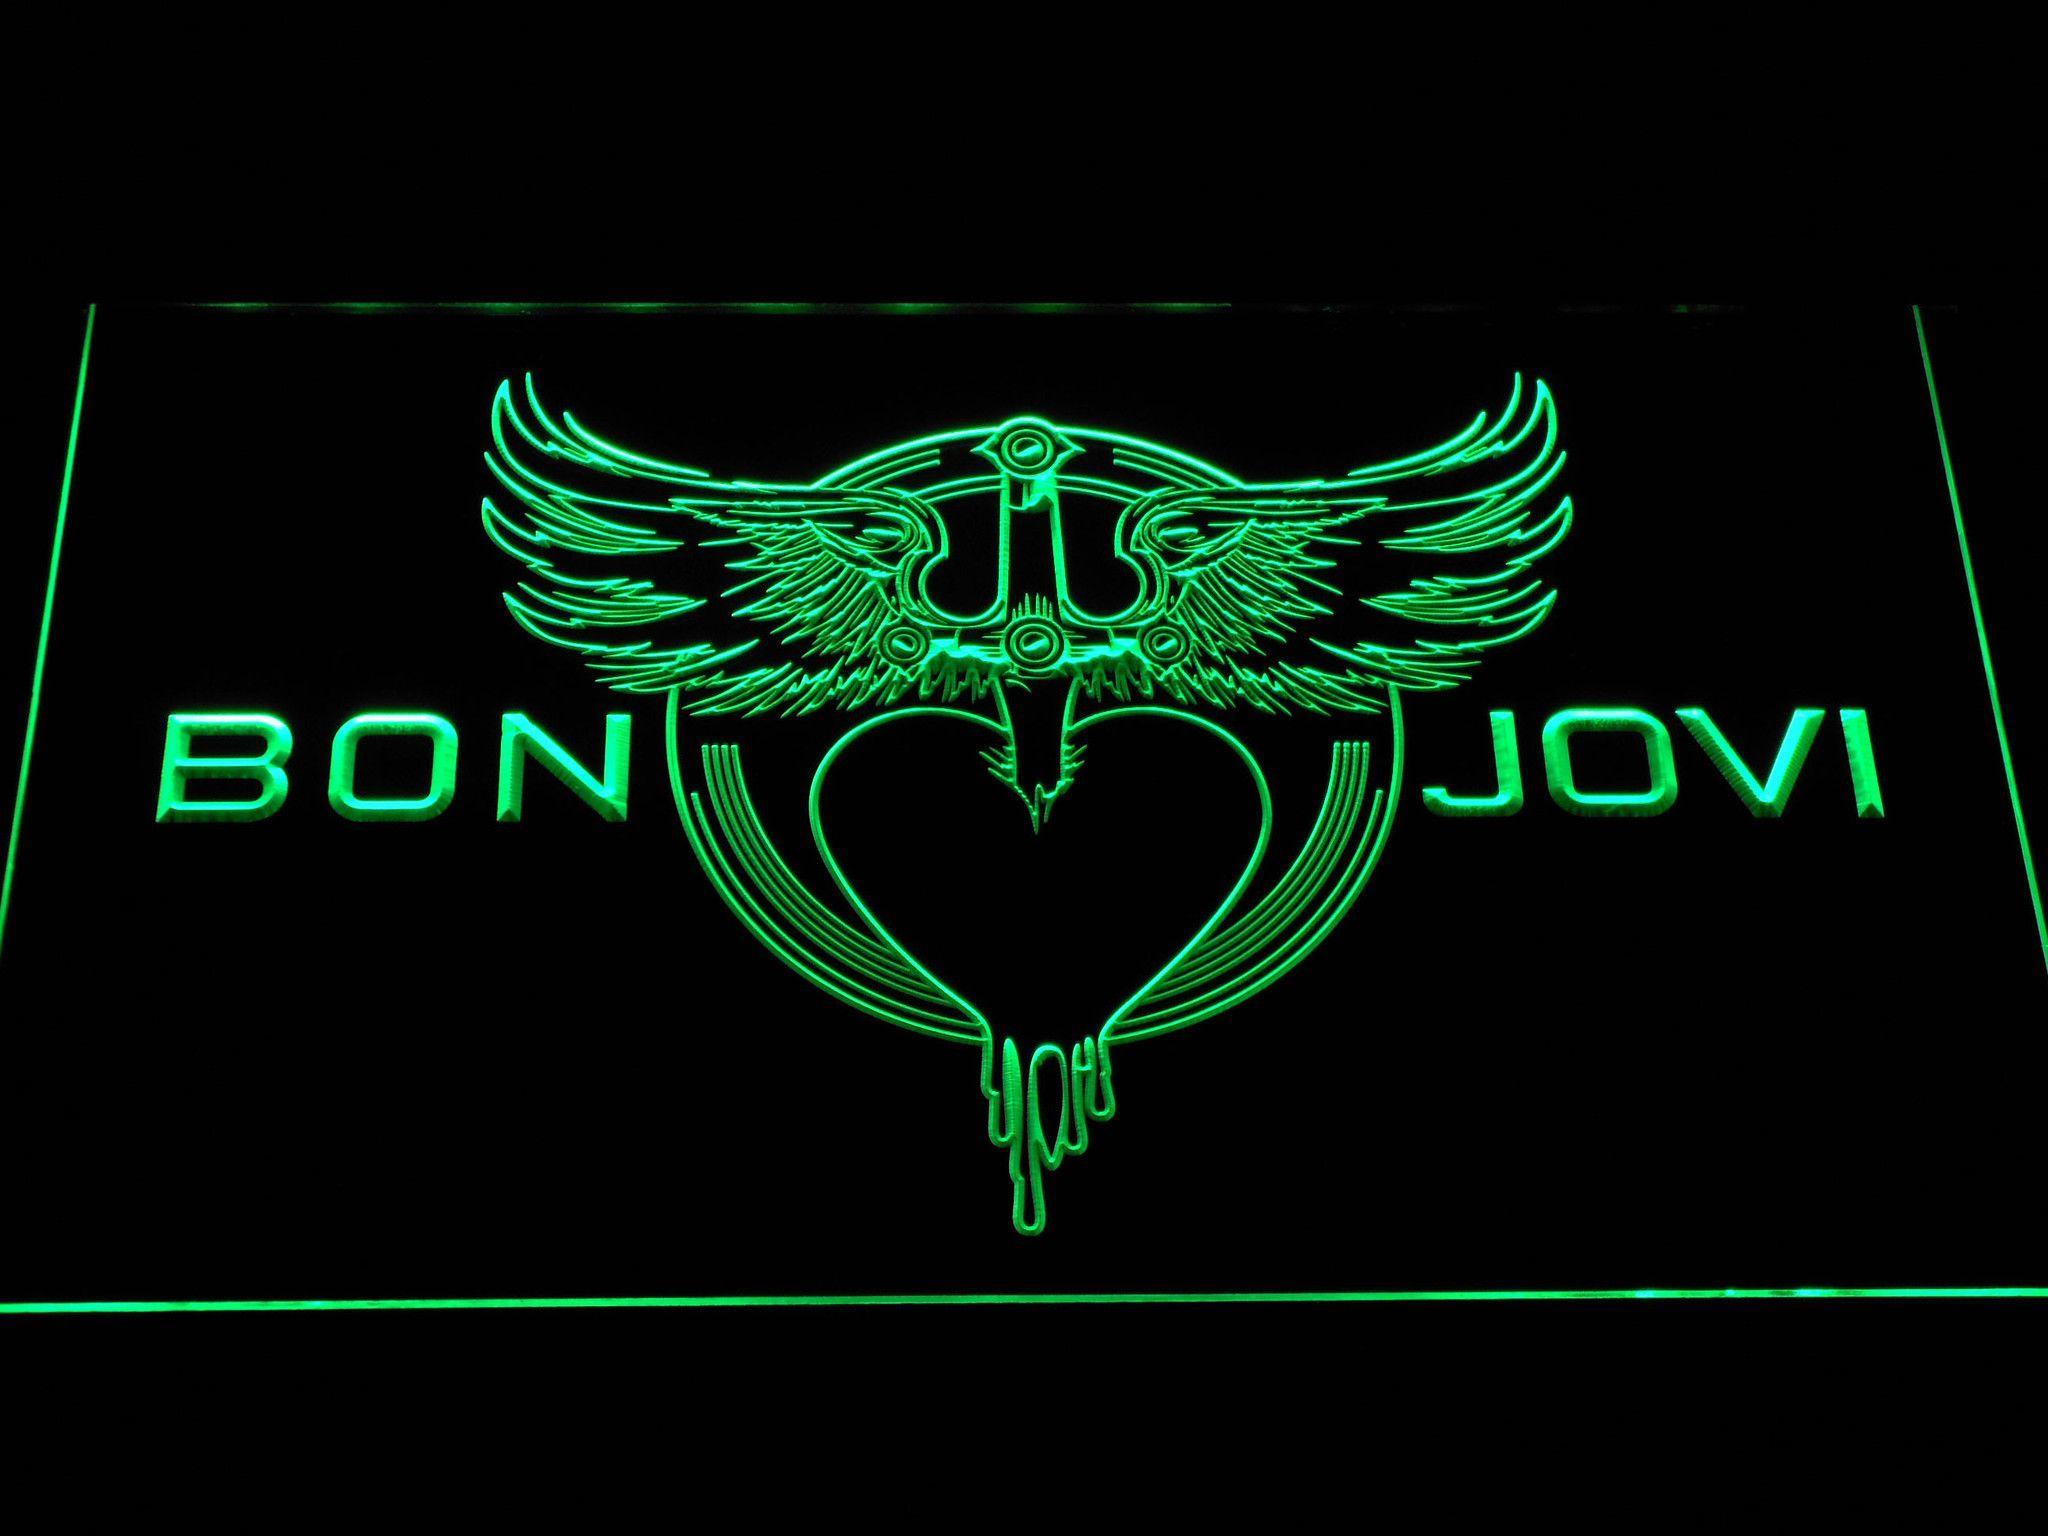 Bon Jovi Heart and Dagger Logo LED Neon Sign